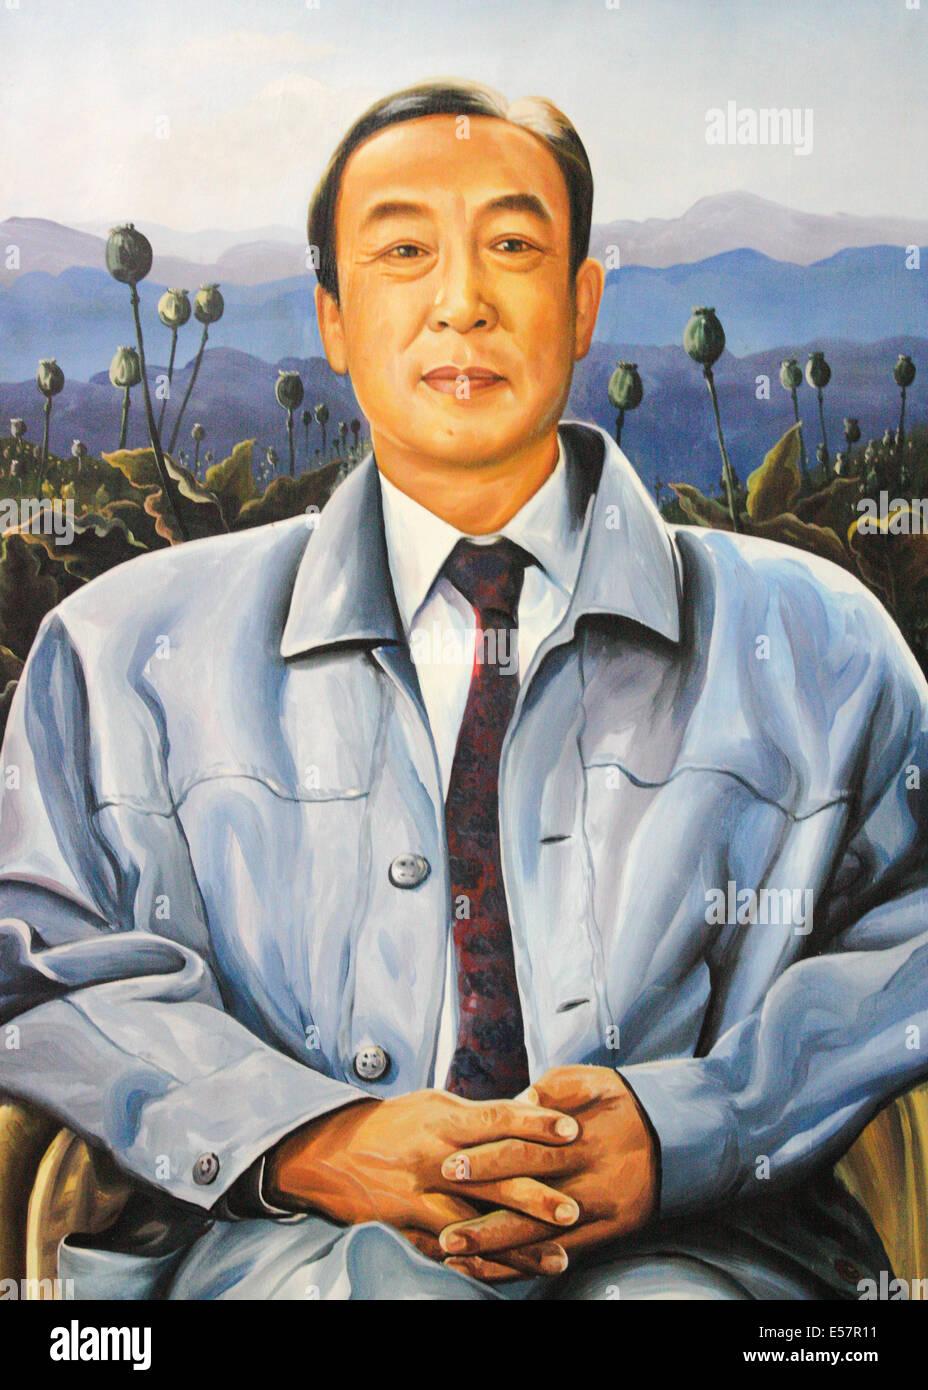 Khun Sa (1934-2007) Burmese warlord aka the 'Opium King' or 'King of the Golden Triangle'. See description - Stock Image